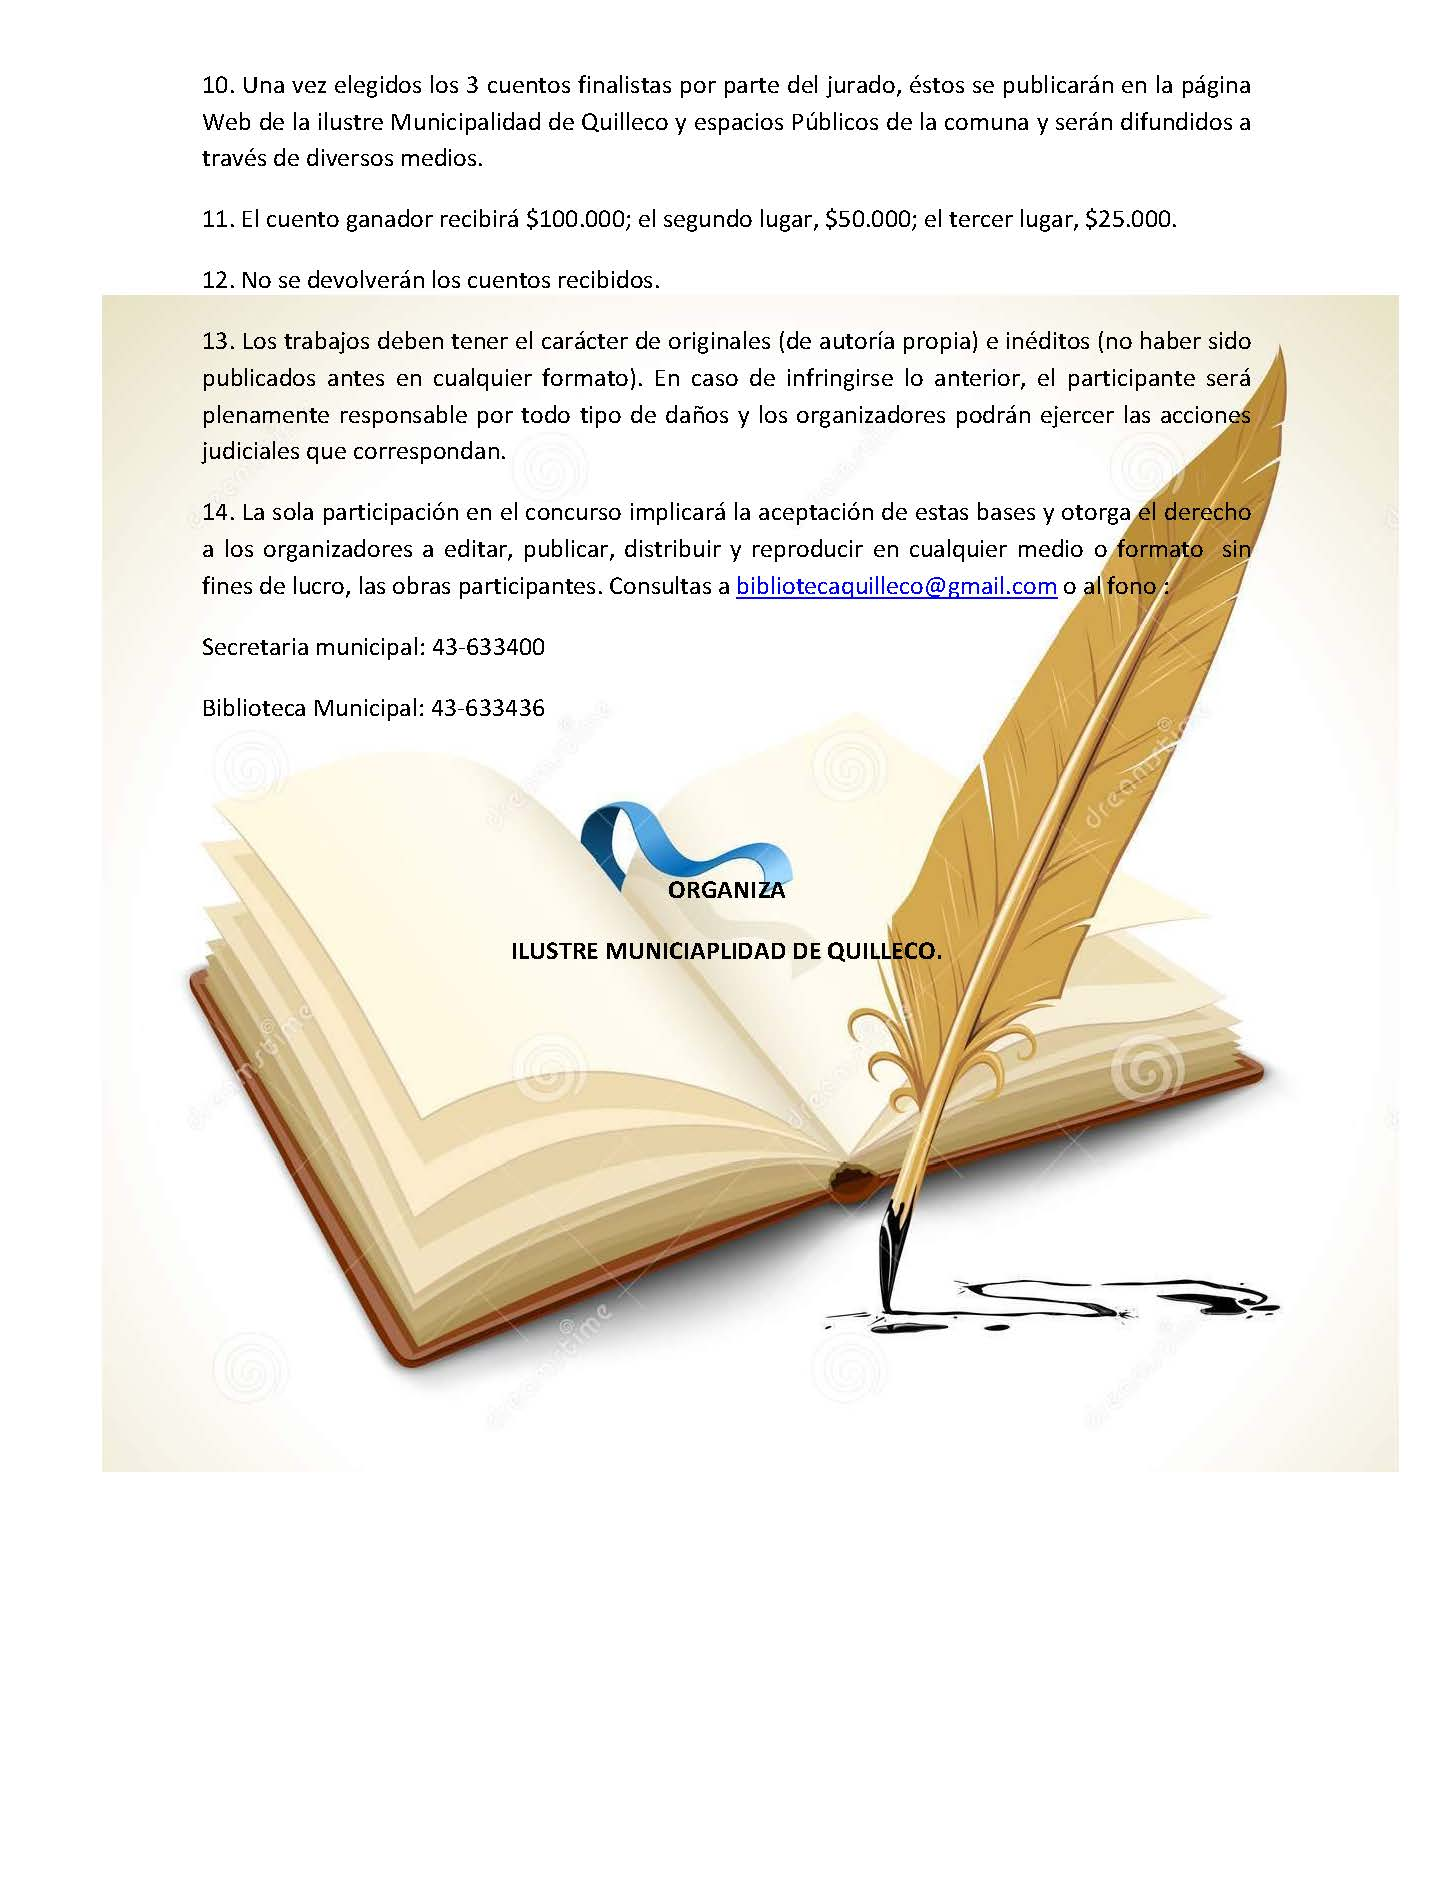 quilleco-en-100-palabras_pagina_2